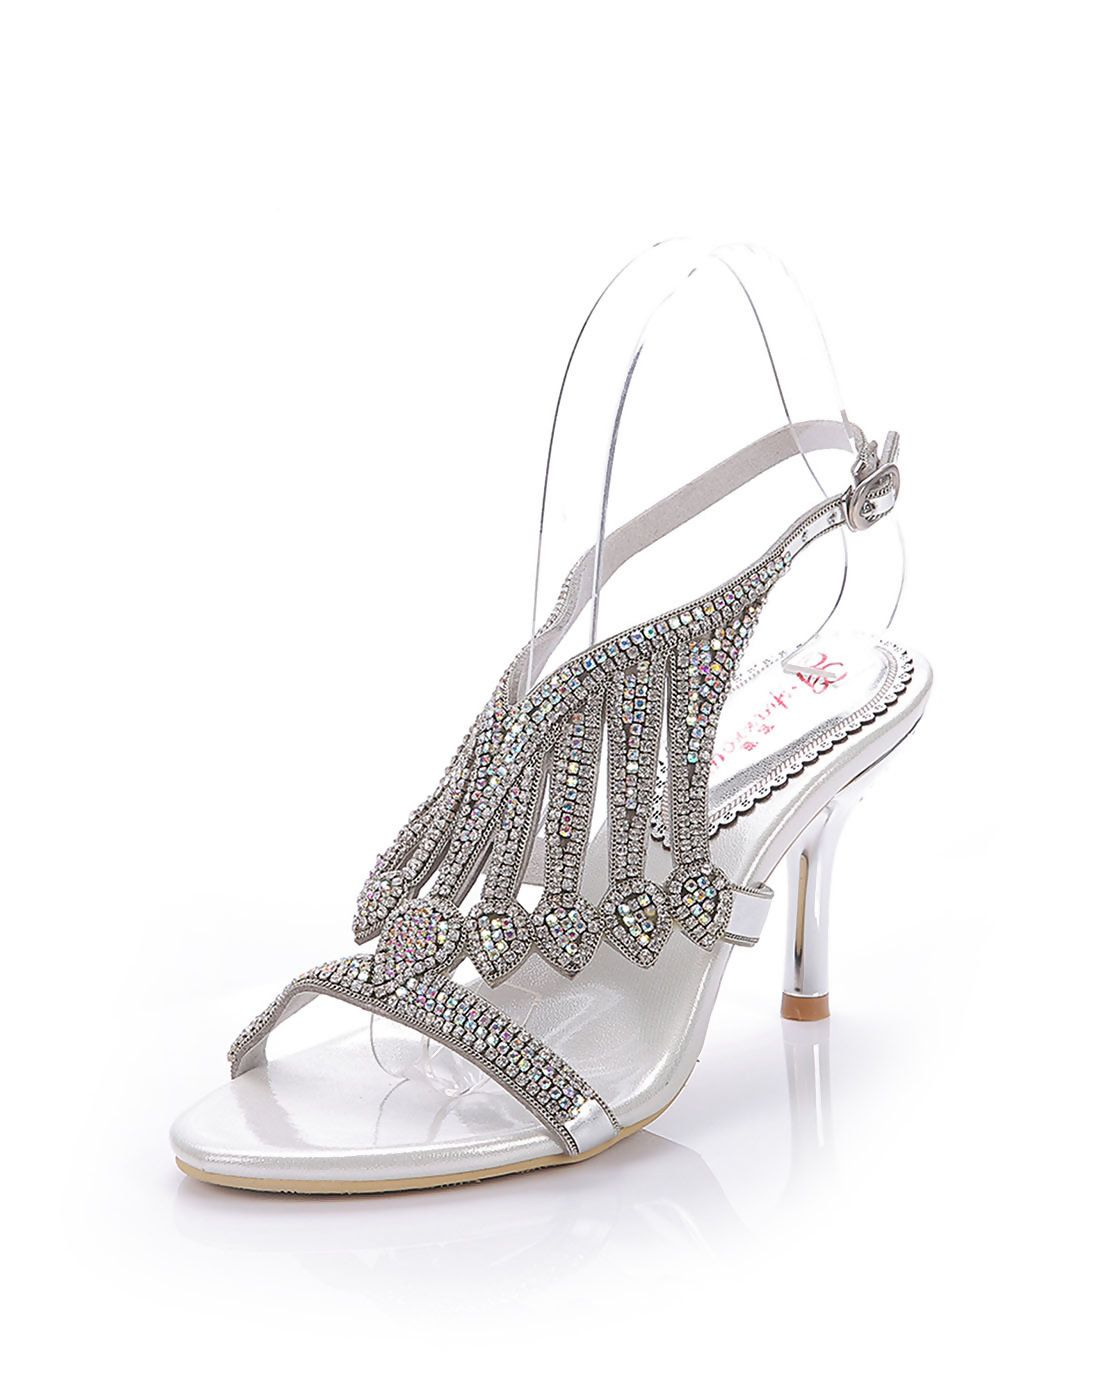 6419728dc8e8  AdoreWe  VIPme Sandals - G·Sharrow Diamond Stiletto Heel Sandals Slingback  Party Silver